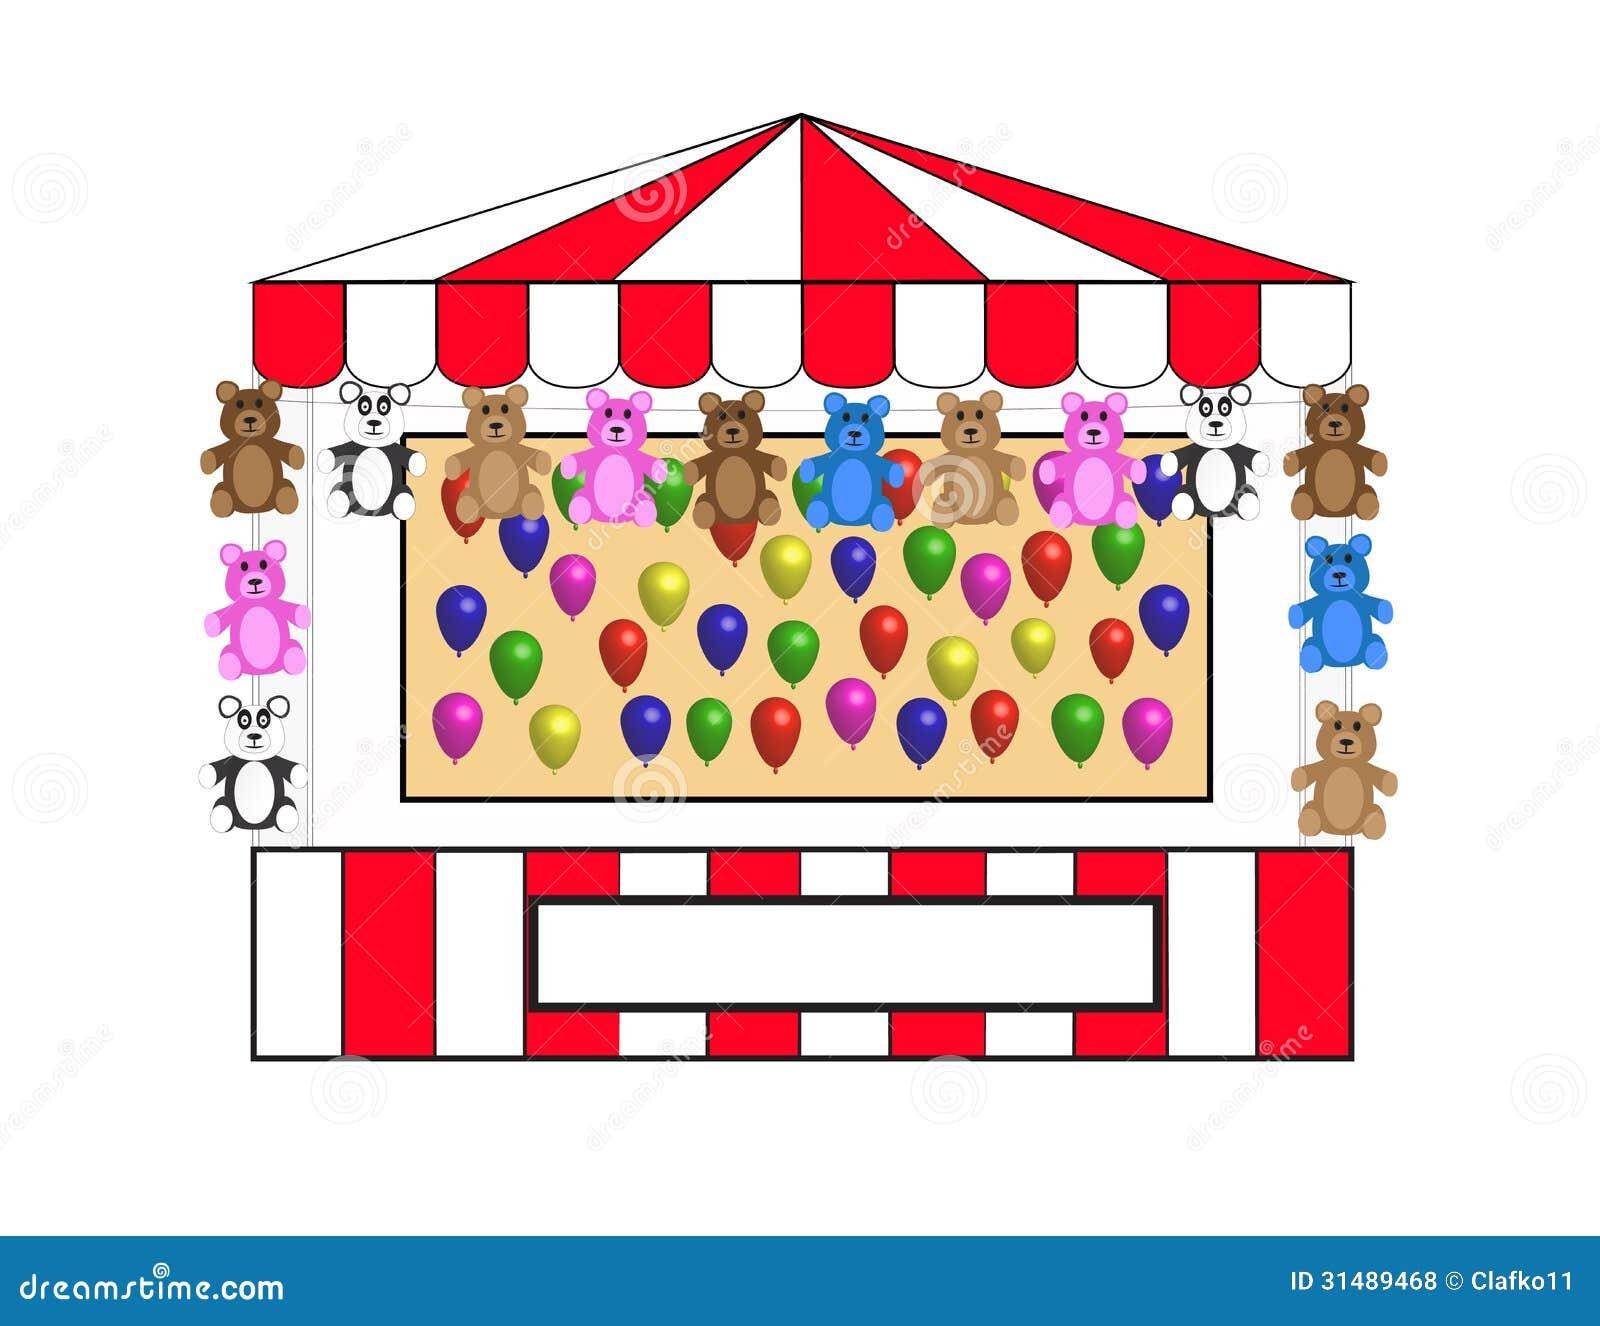 Balloon Toss W Bears Royalty Free Stock Photos - Image: 31489468